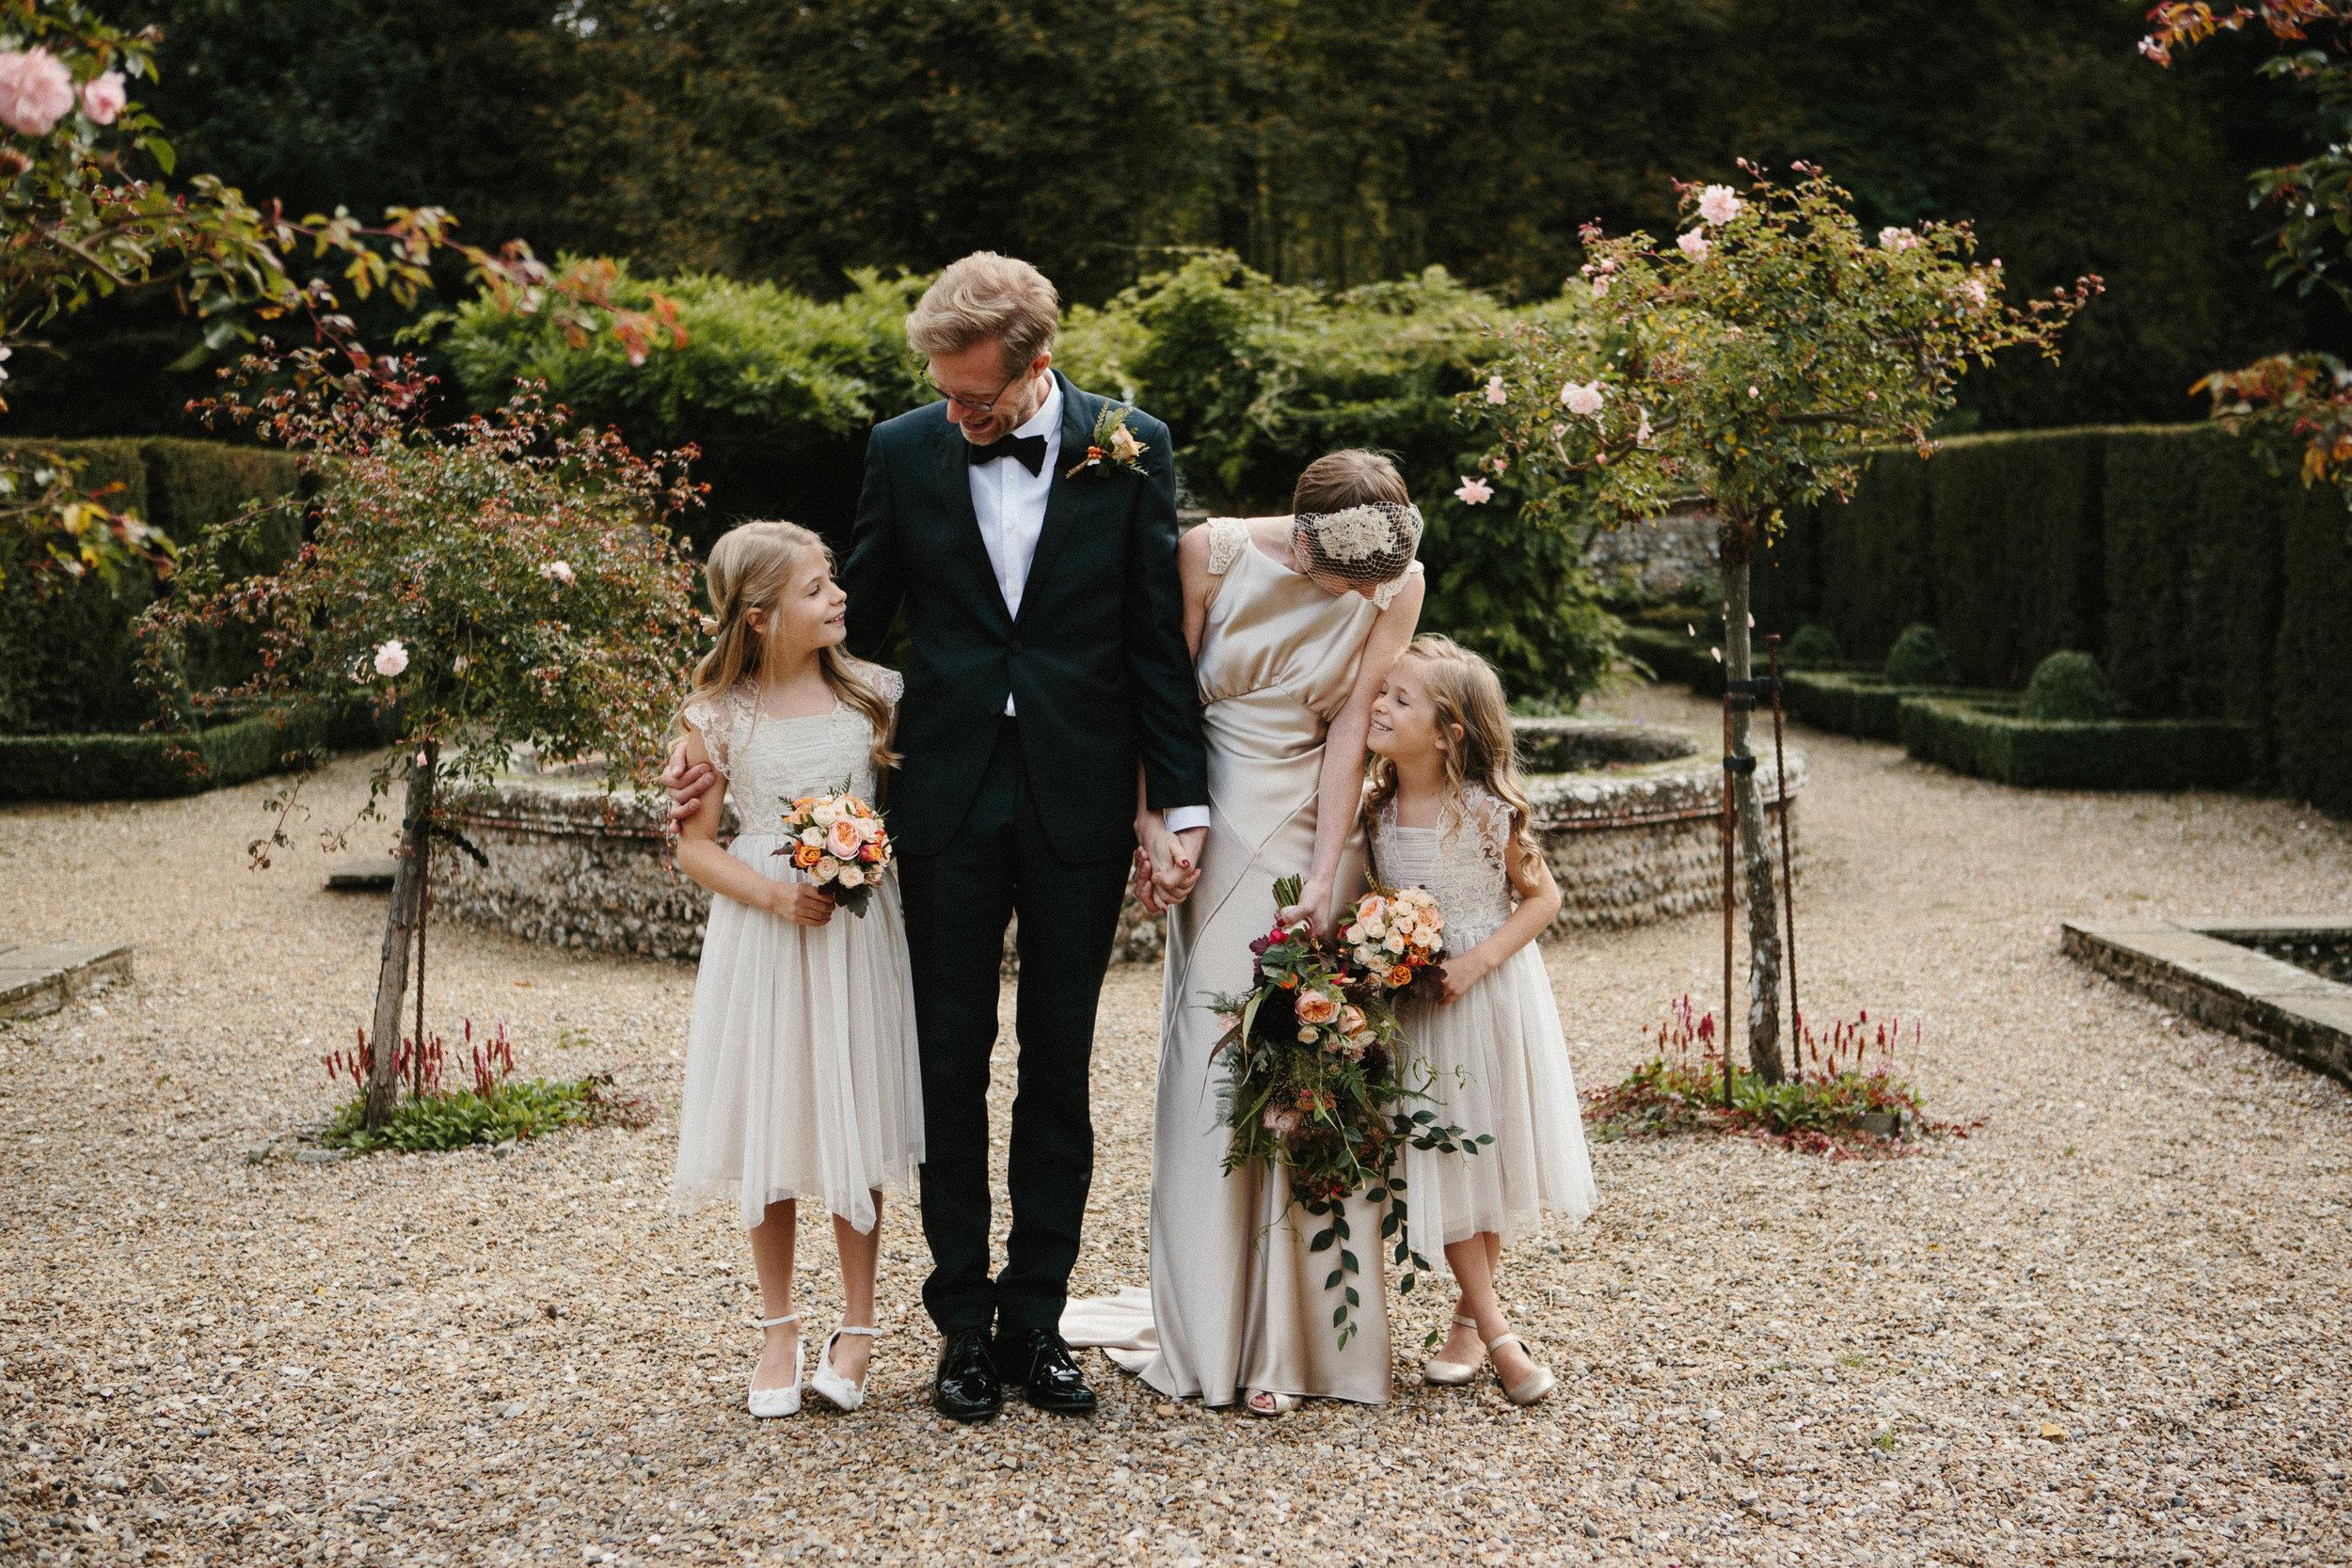 Kate-Beaumont-Sheffield-Honeysuckle-bias-cut-wedding-dress-oyster-Rosie20.jpg